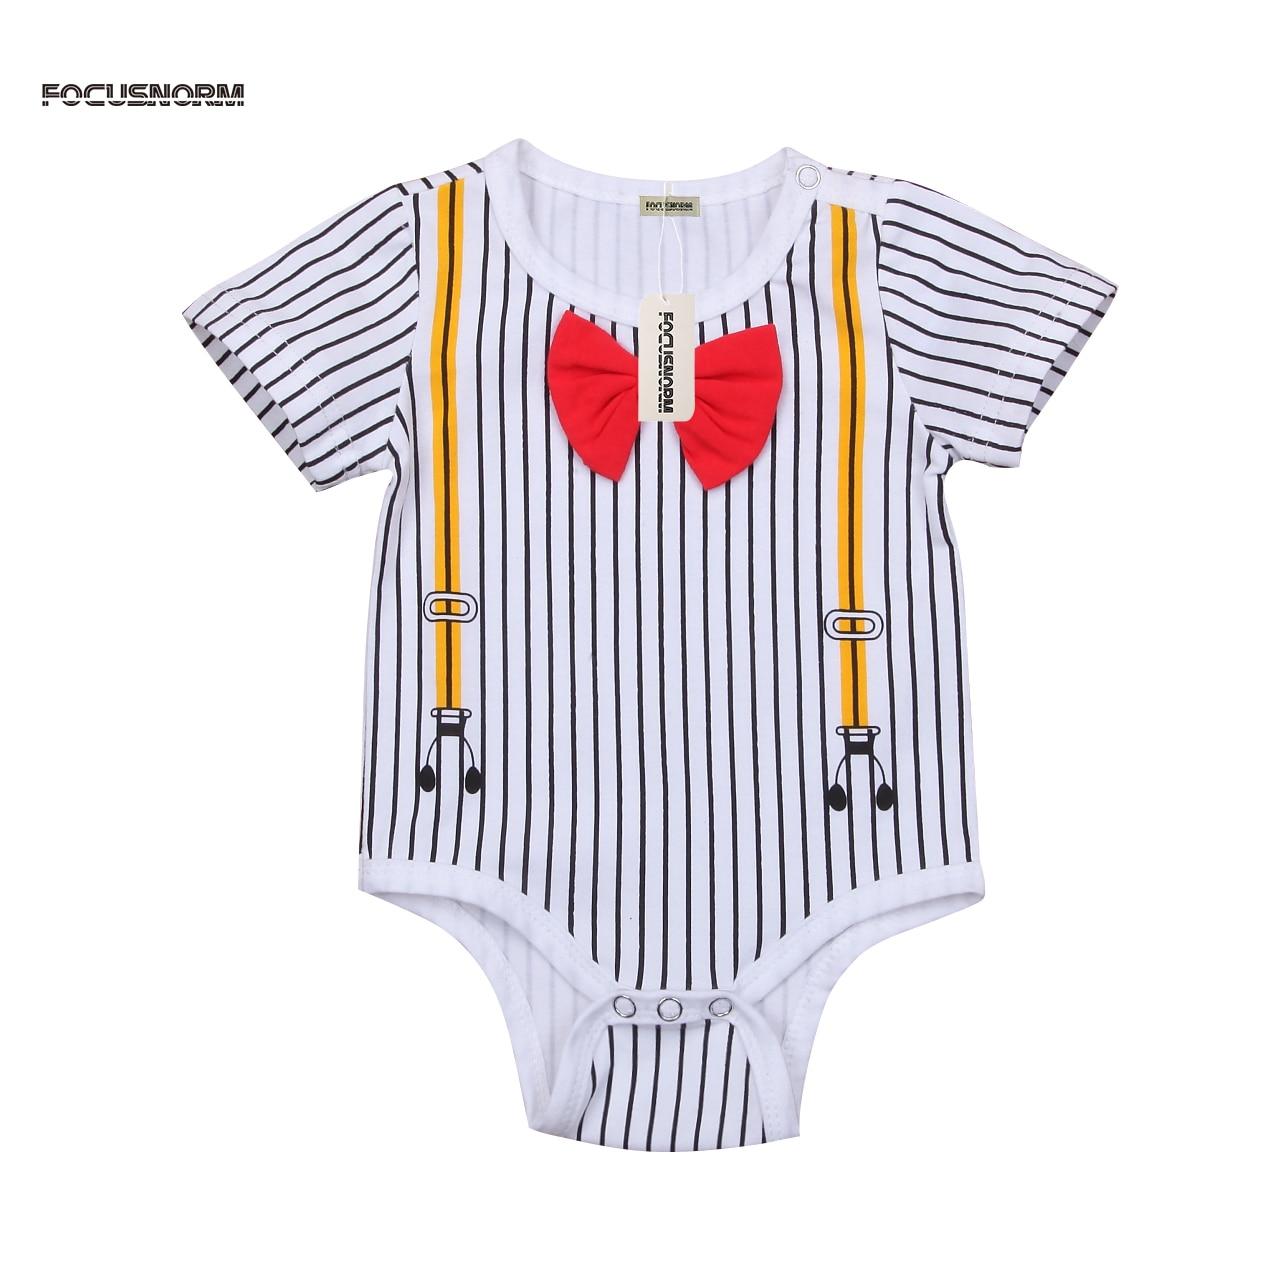 ee15d9b20 Cool Newborn Baby Boy Gentleman Bodysuit Red Bow Tie Striped ...